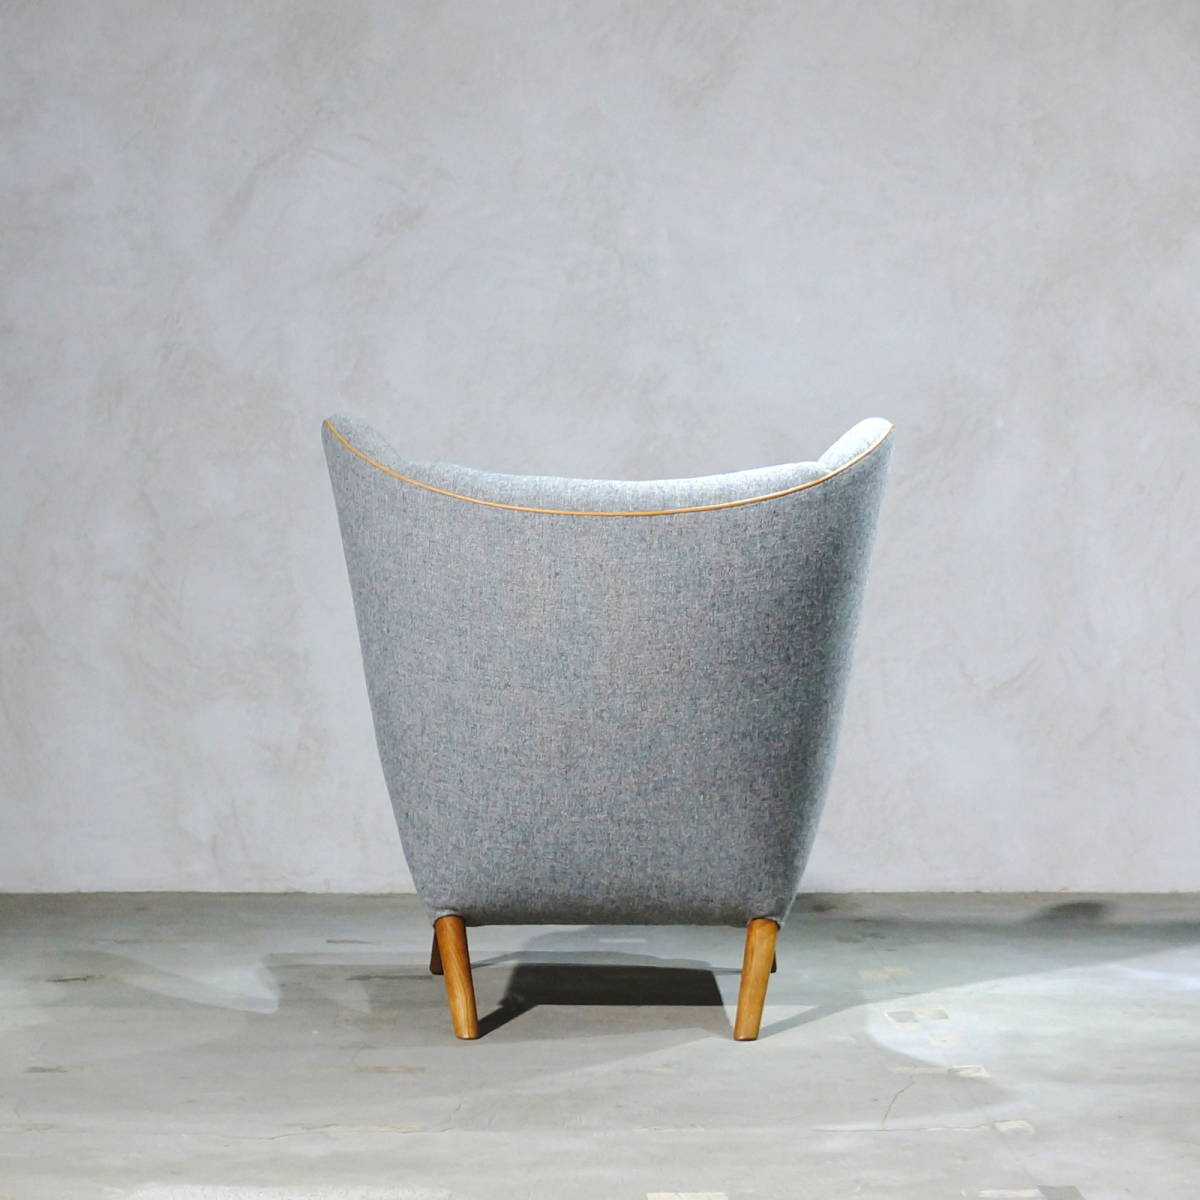 Hans J. Wegner ウェグナー AP-19 Bear Chair ベアチェア Teak & Oak チークオーク ※フィンユール モーエンセン_画像4